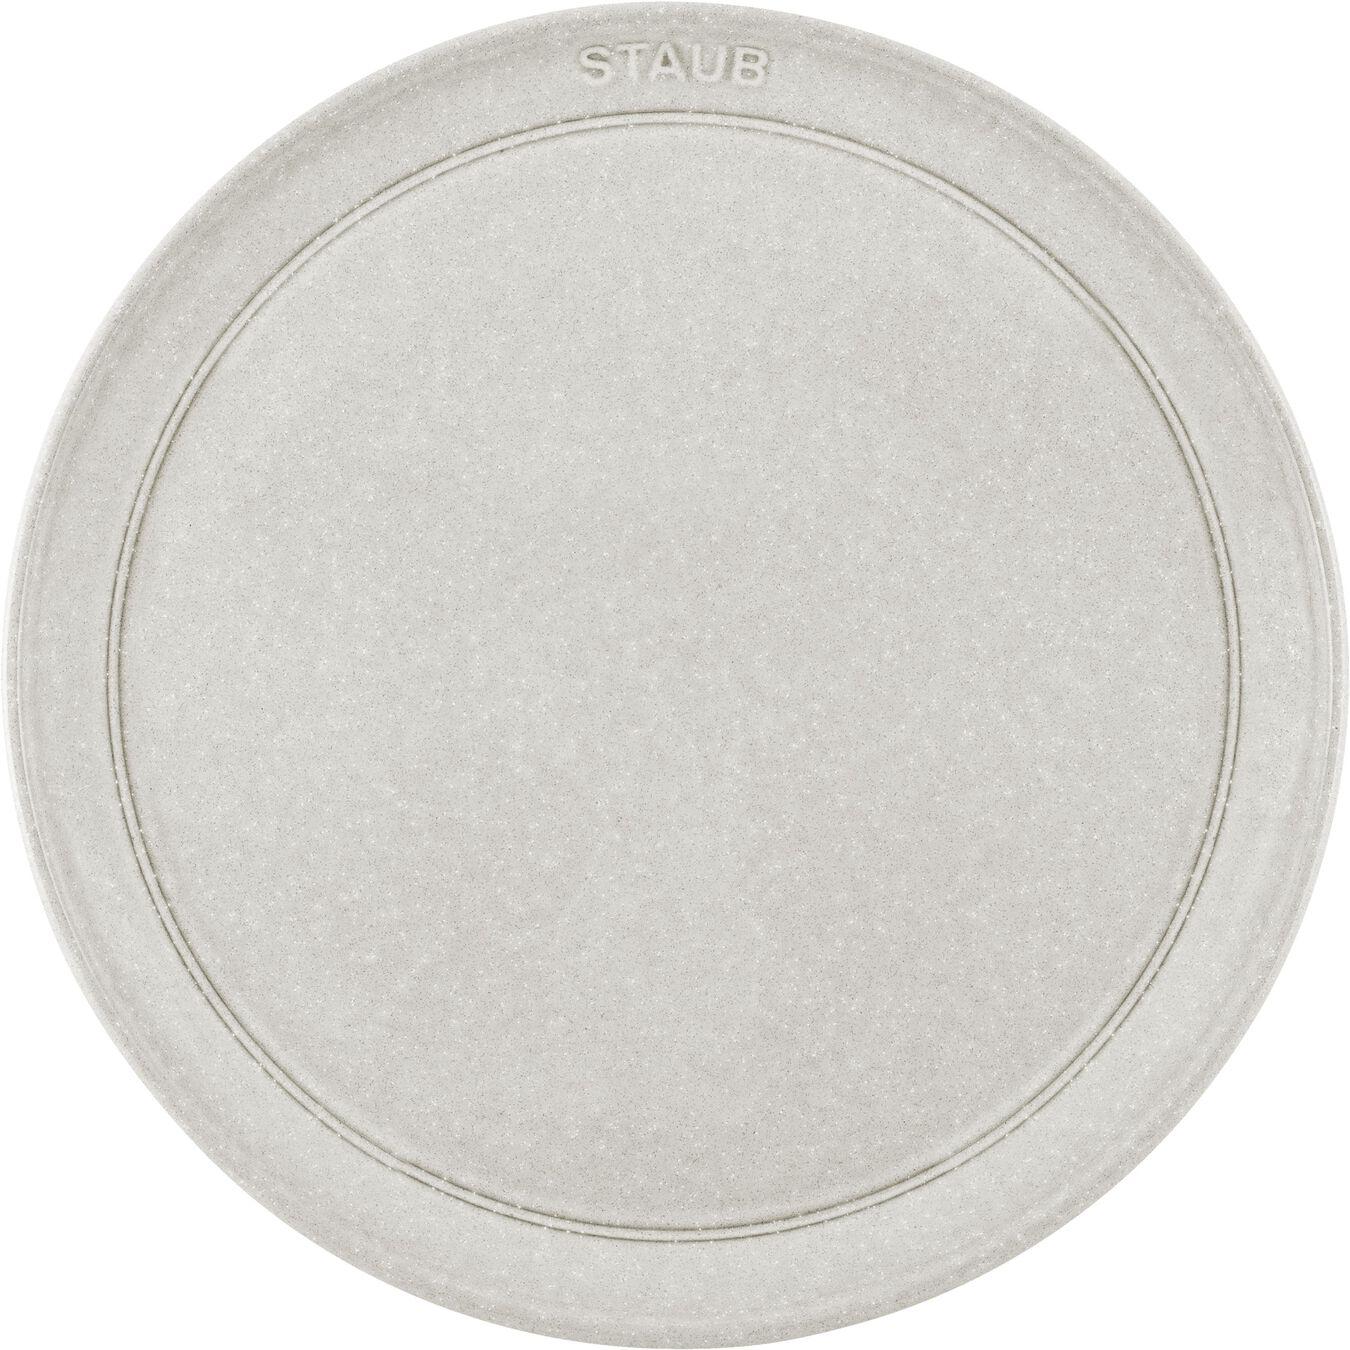 Teller flach 26 cm, Keramik, Weisser Trüffel,,large 2